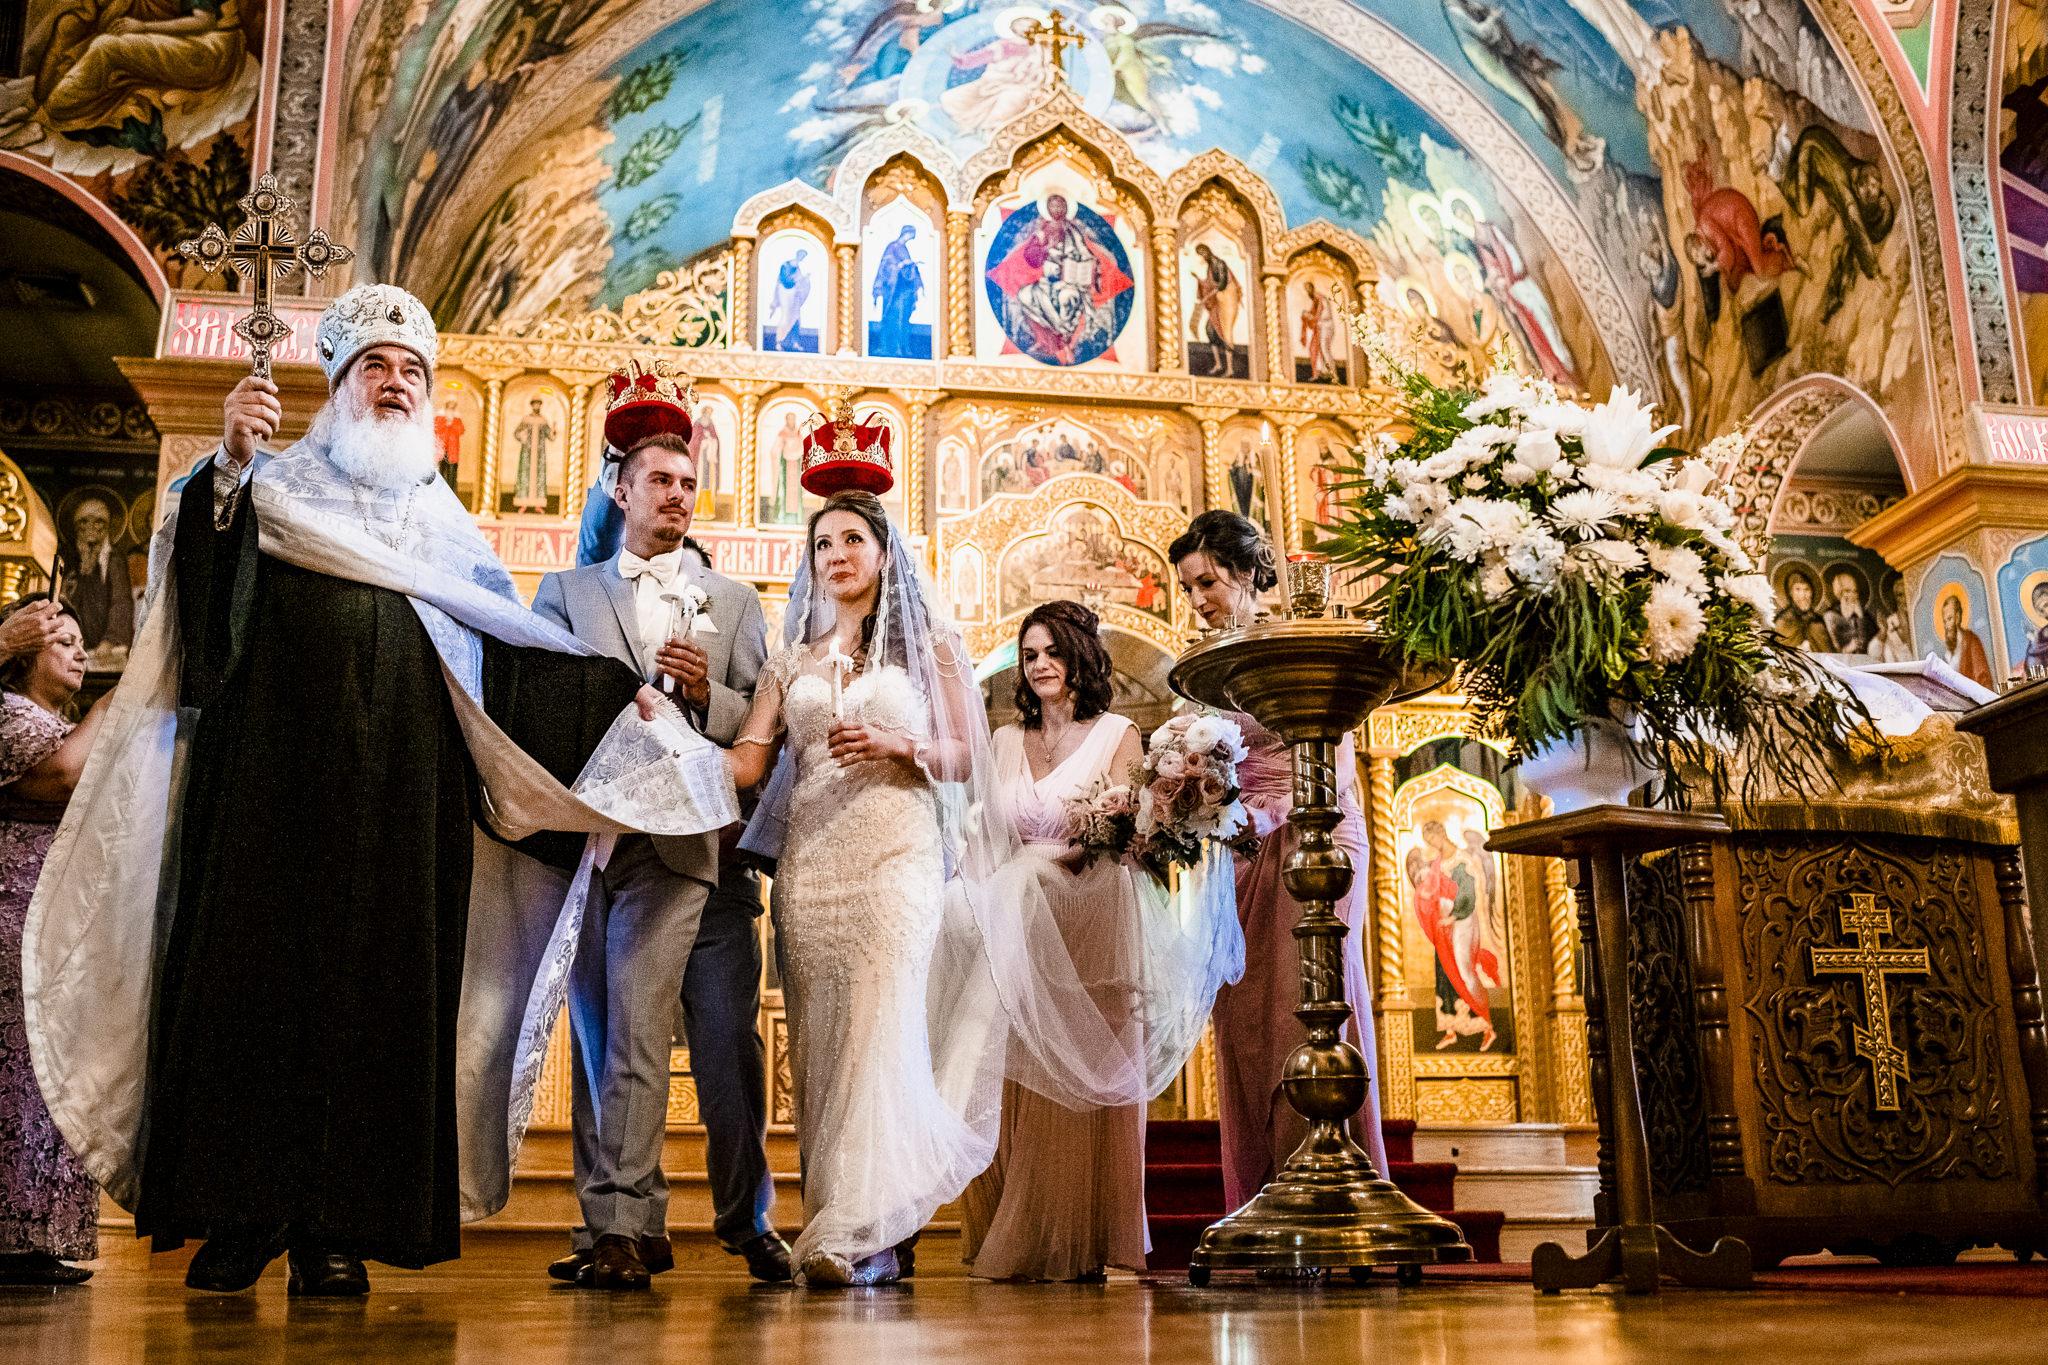 Barbato-Moorestown-Community-House-Wedding-New-Jersey-Photographer-12.JPG